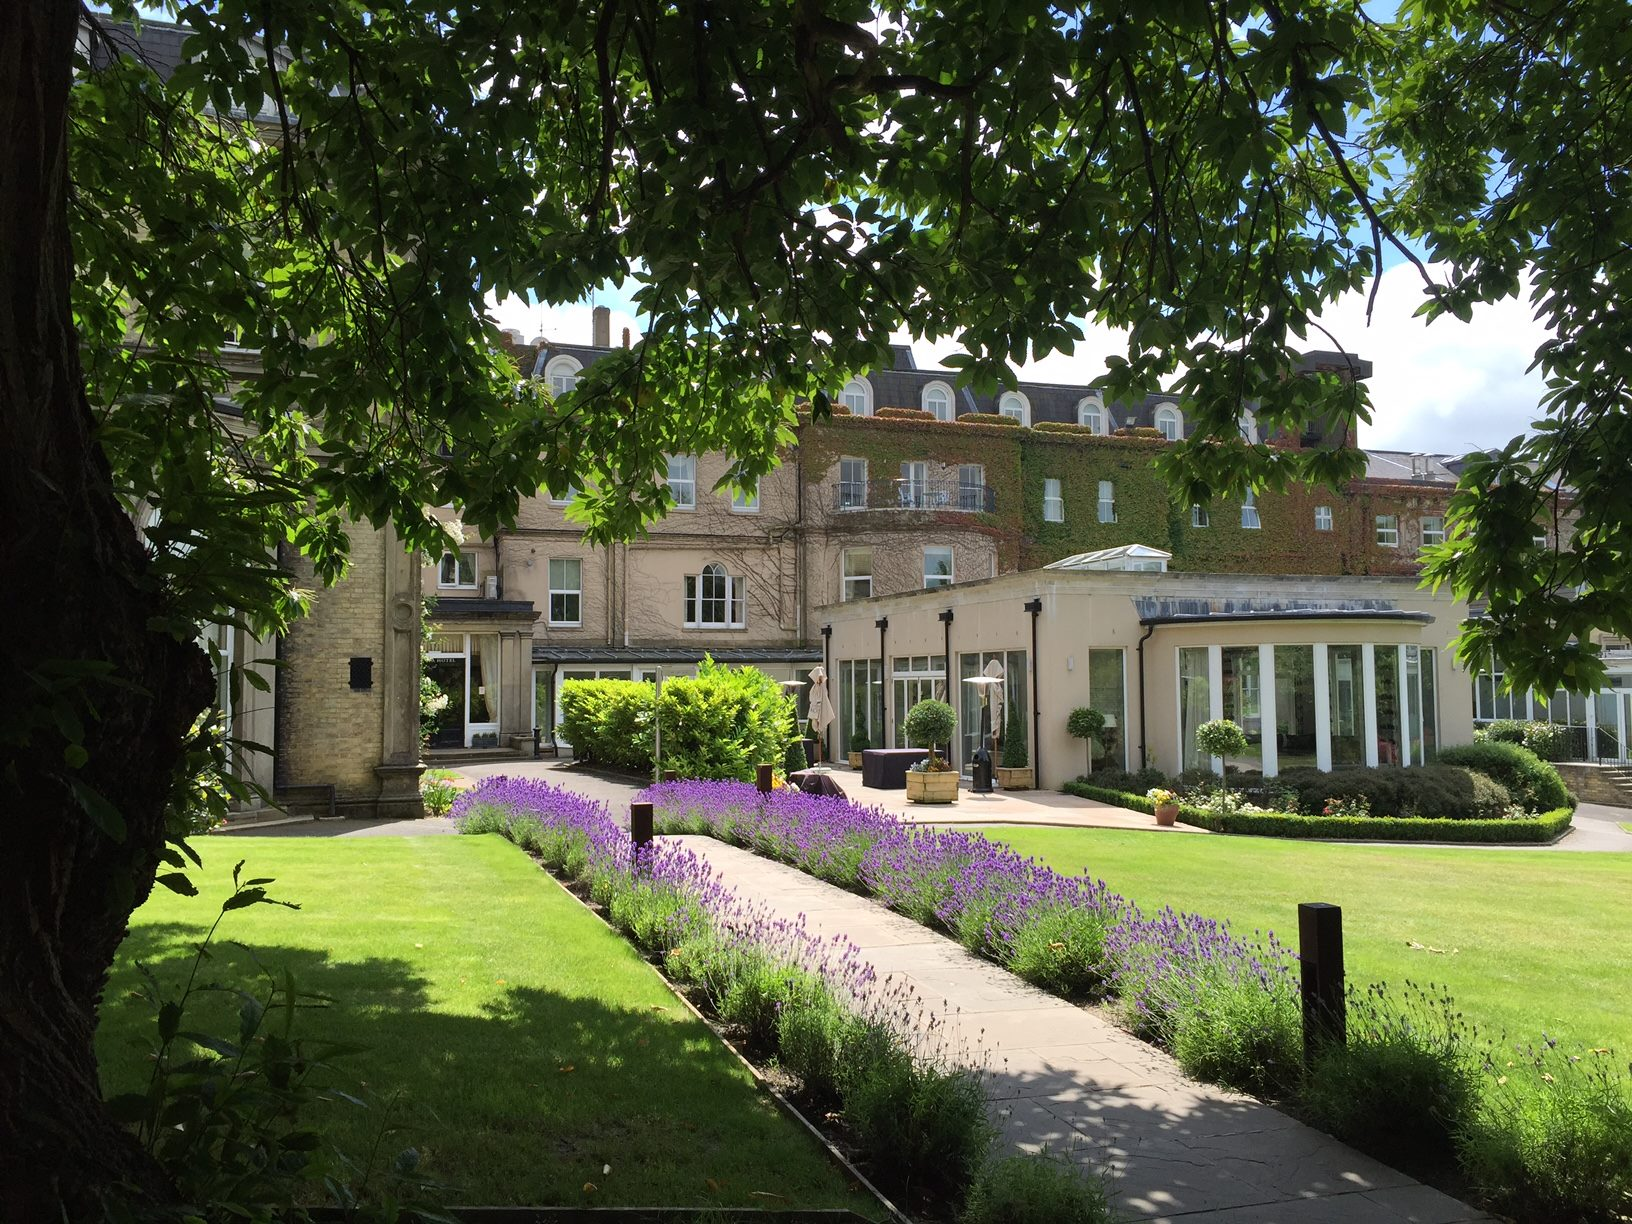 The Spa Hotel Tunbridge Wells